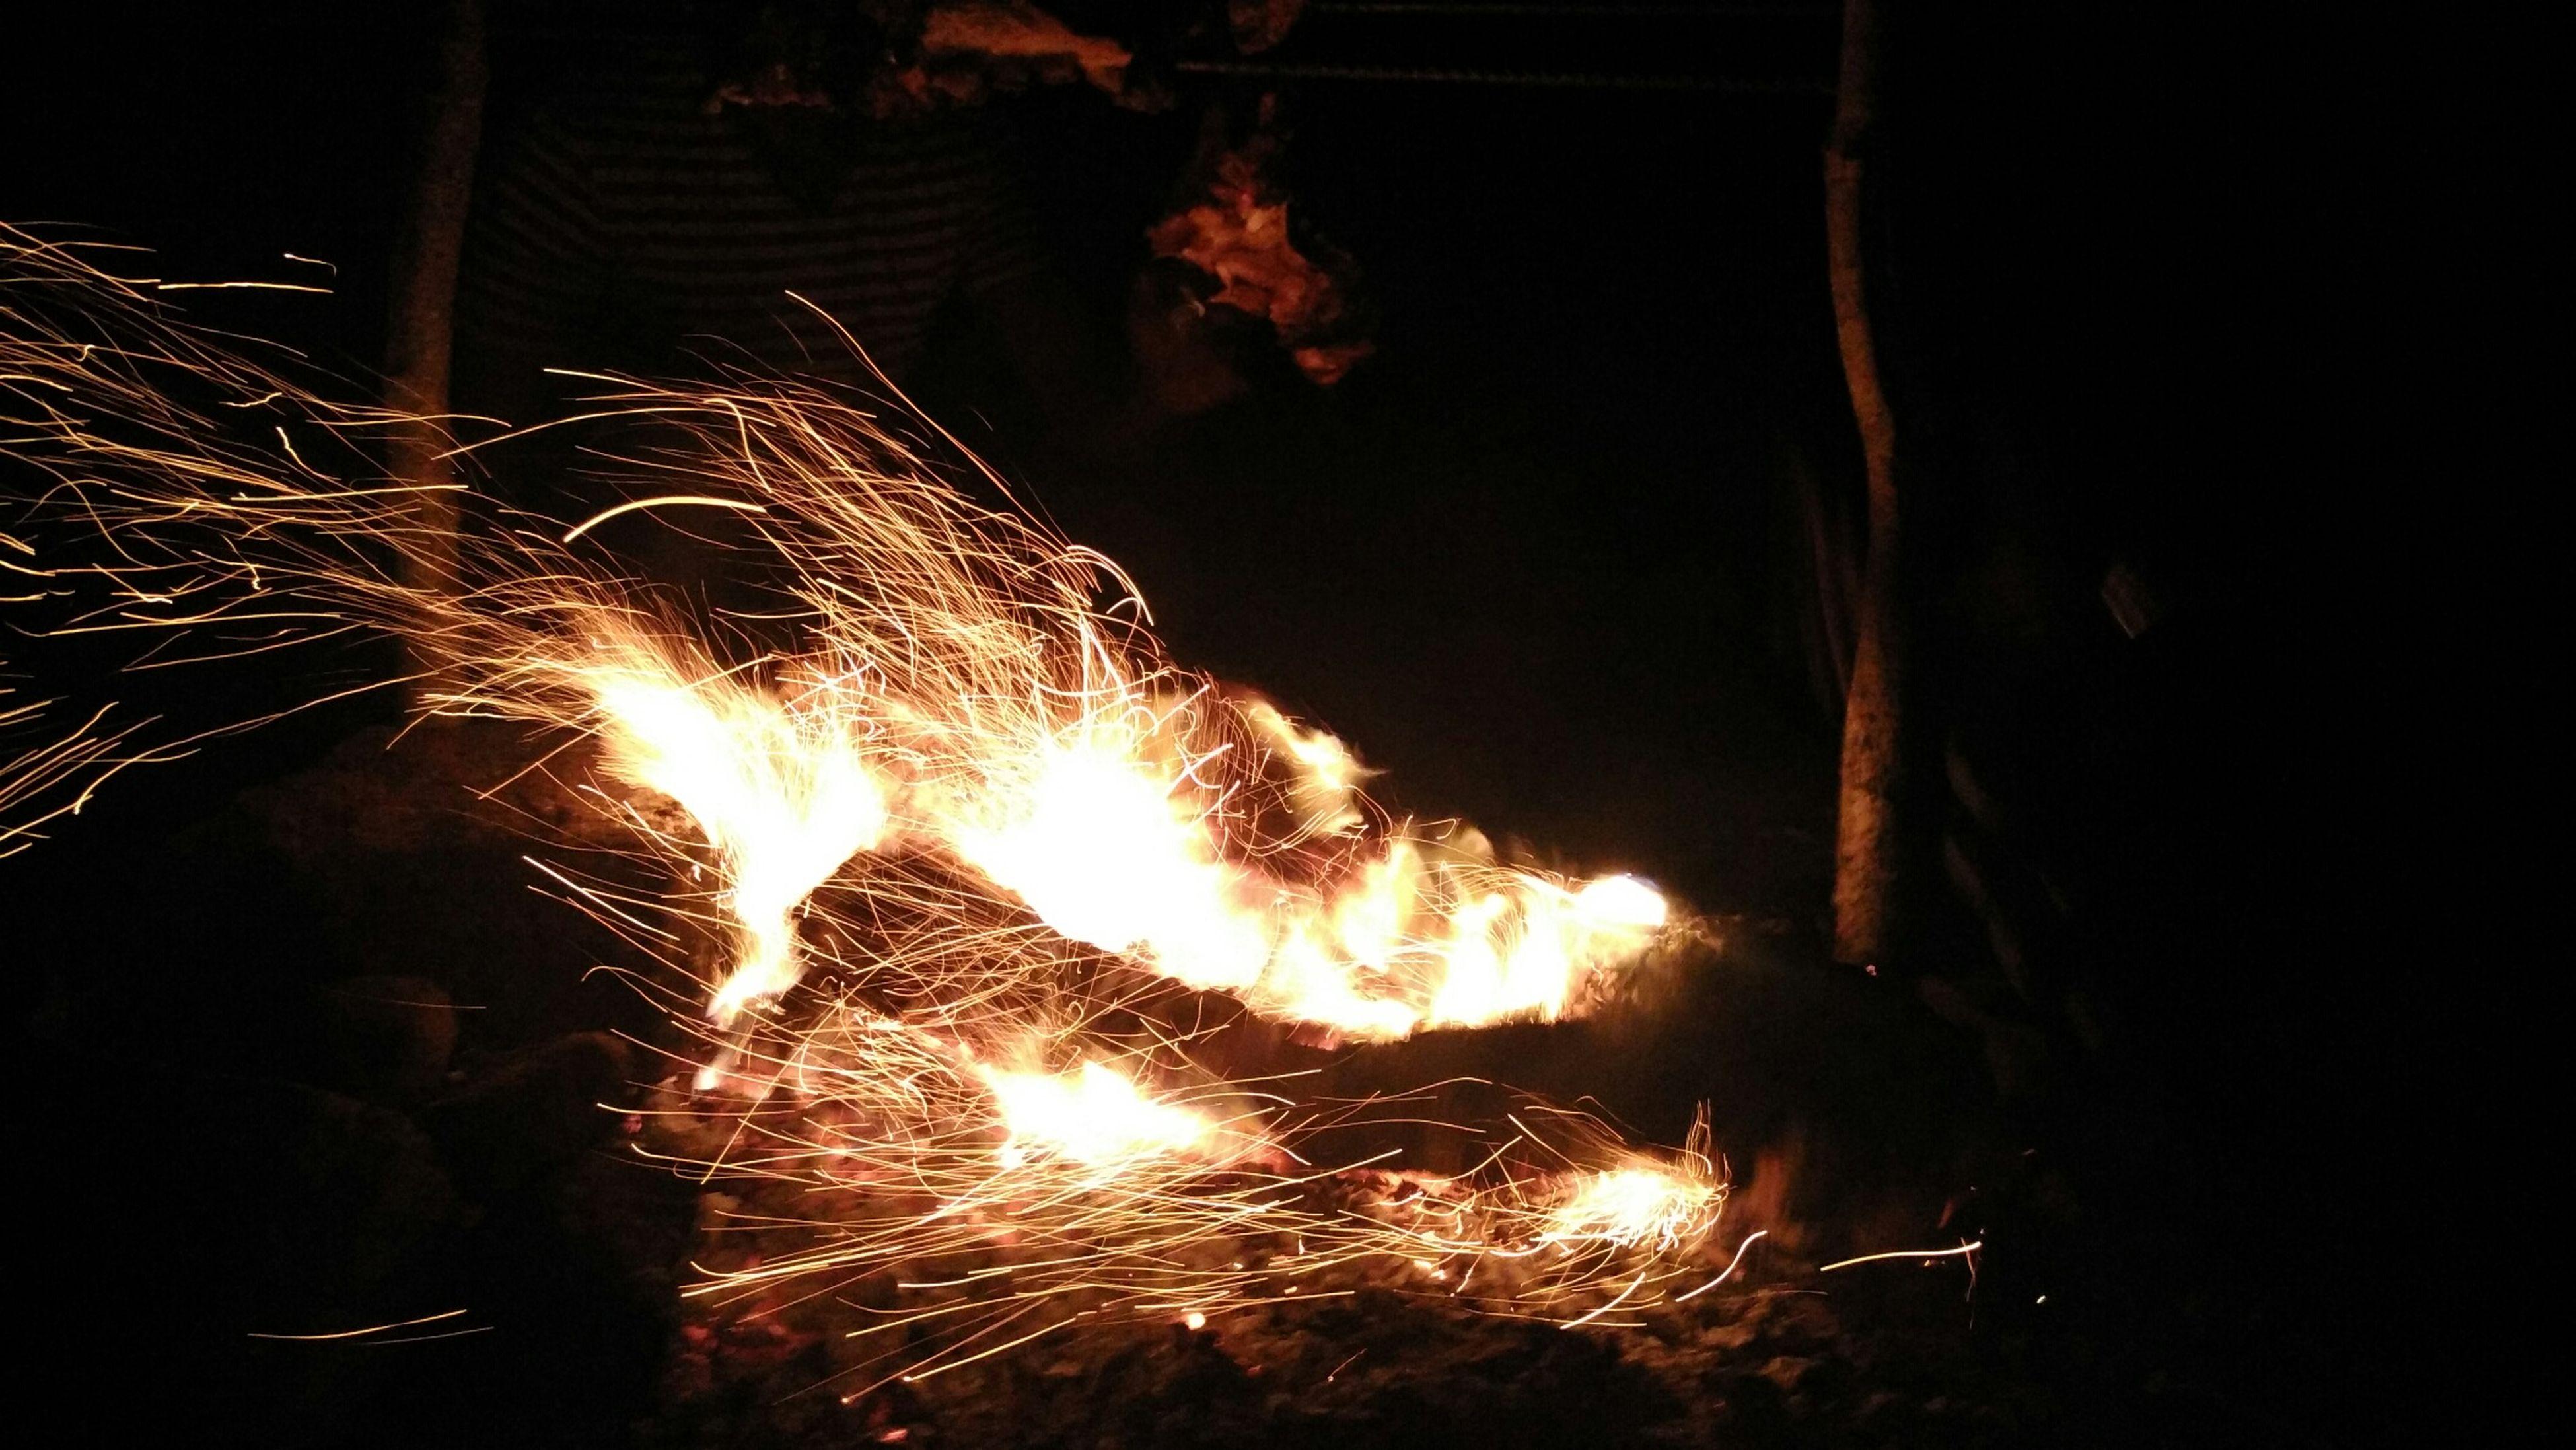 illuminated, night, glowing, fire - natural phenomenon, celebration, long exposure, lighting equipment, firework display, burning, sparks, exploding, flame, light - natural phenomenon, low angle view, motion, dark, light, lit, decoration, firework - man made object